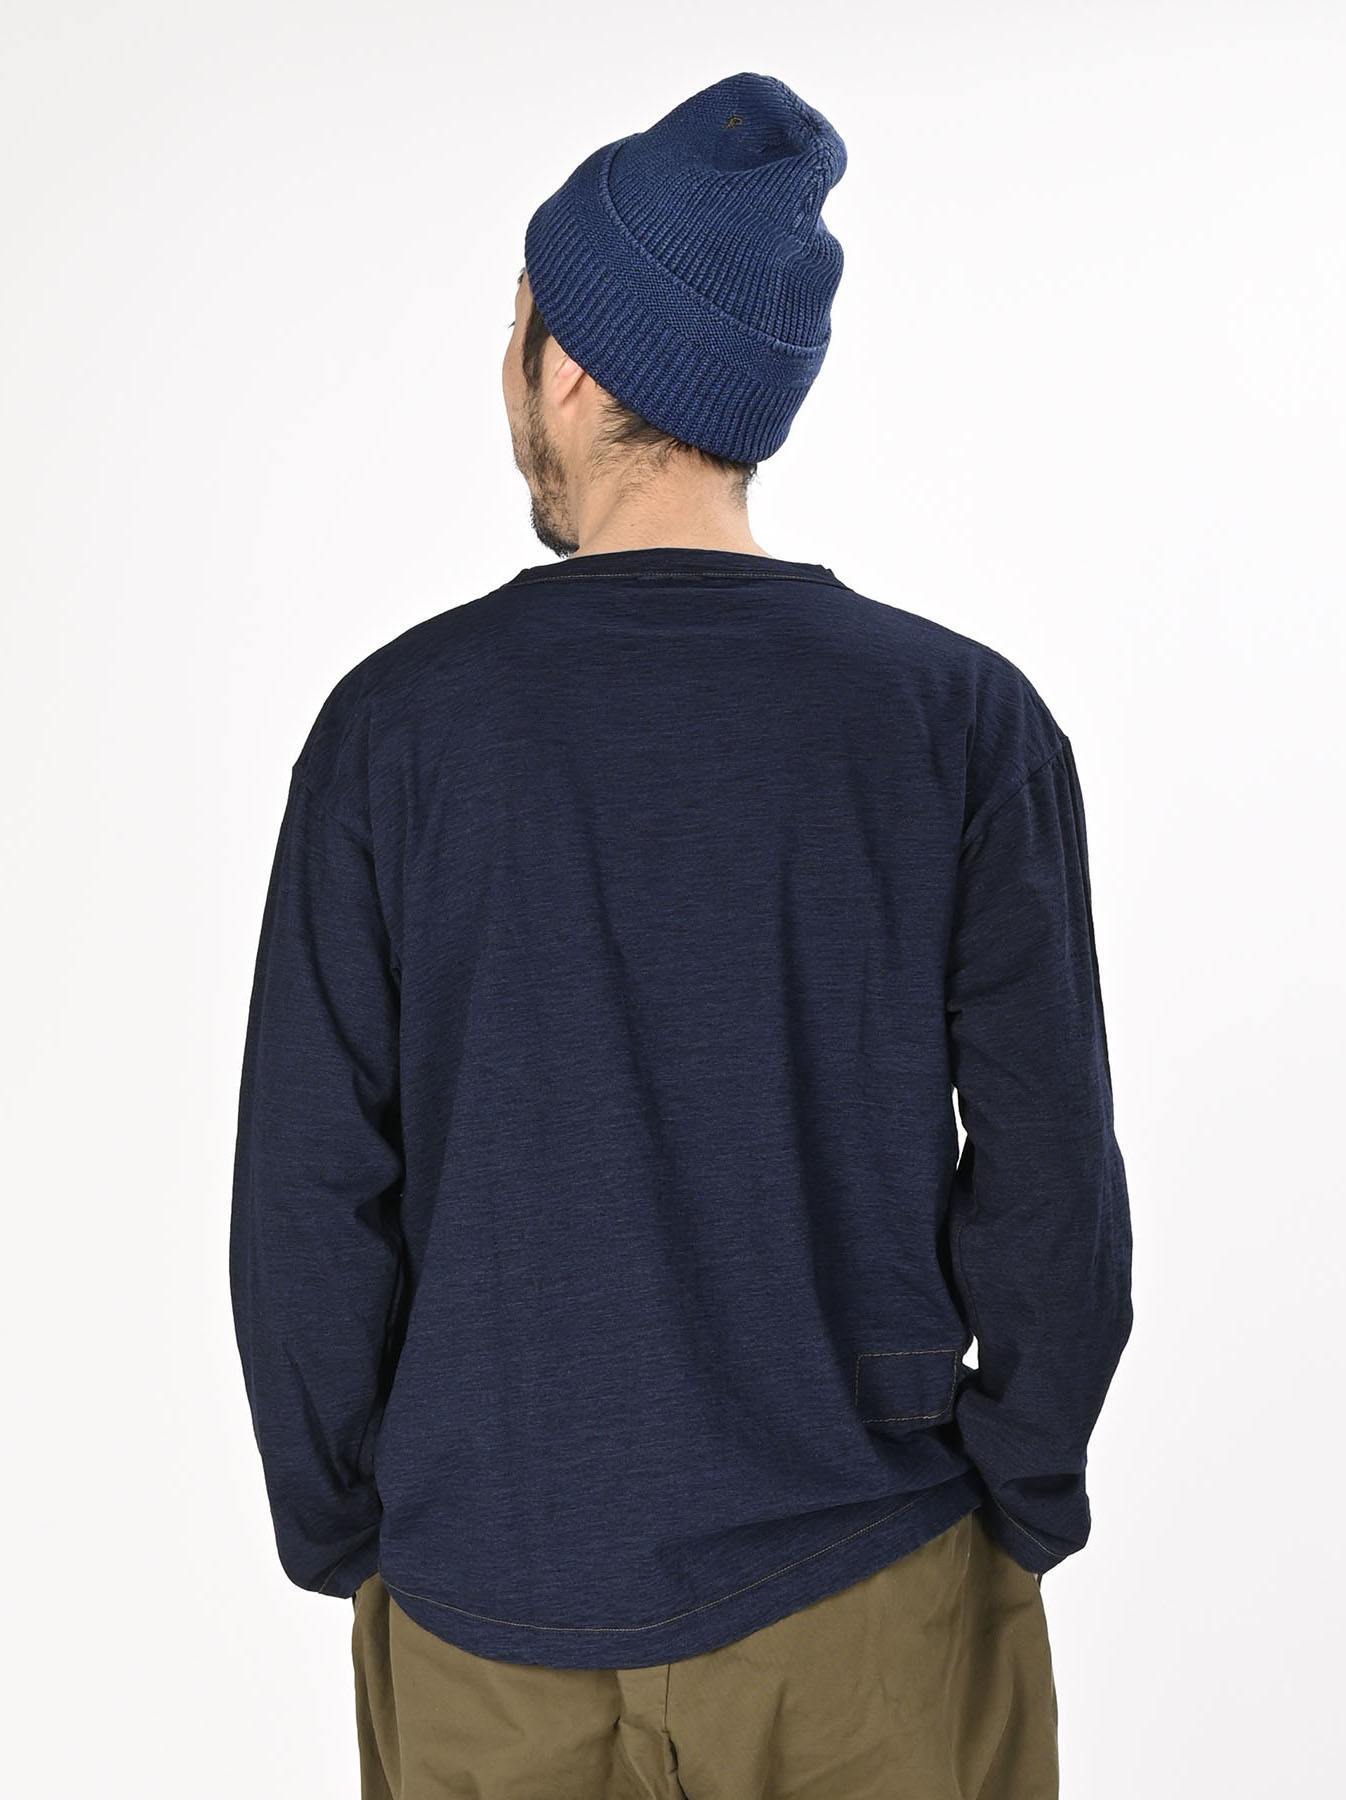 Indigo Zimbabwe 908 Ocean T-shirt-5